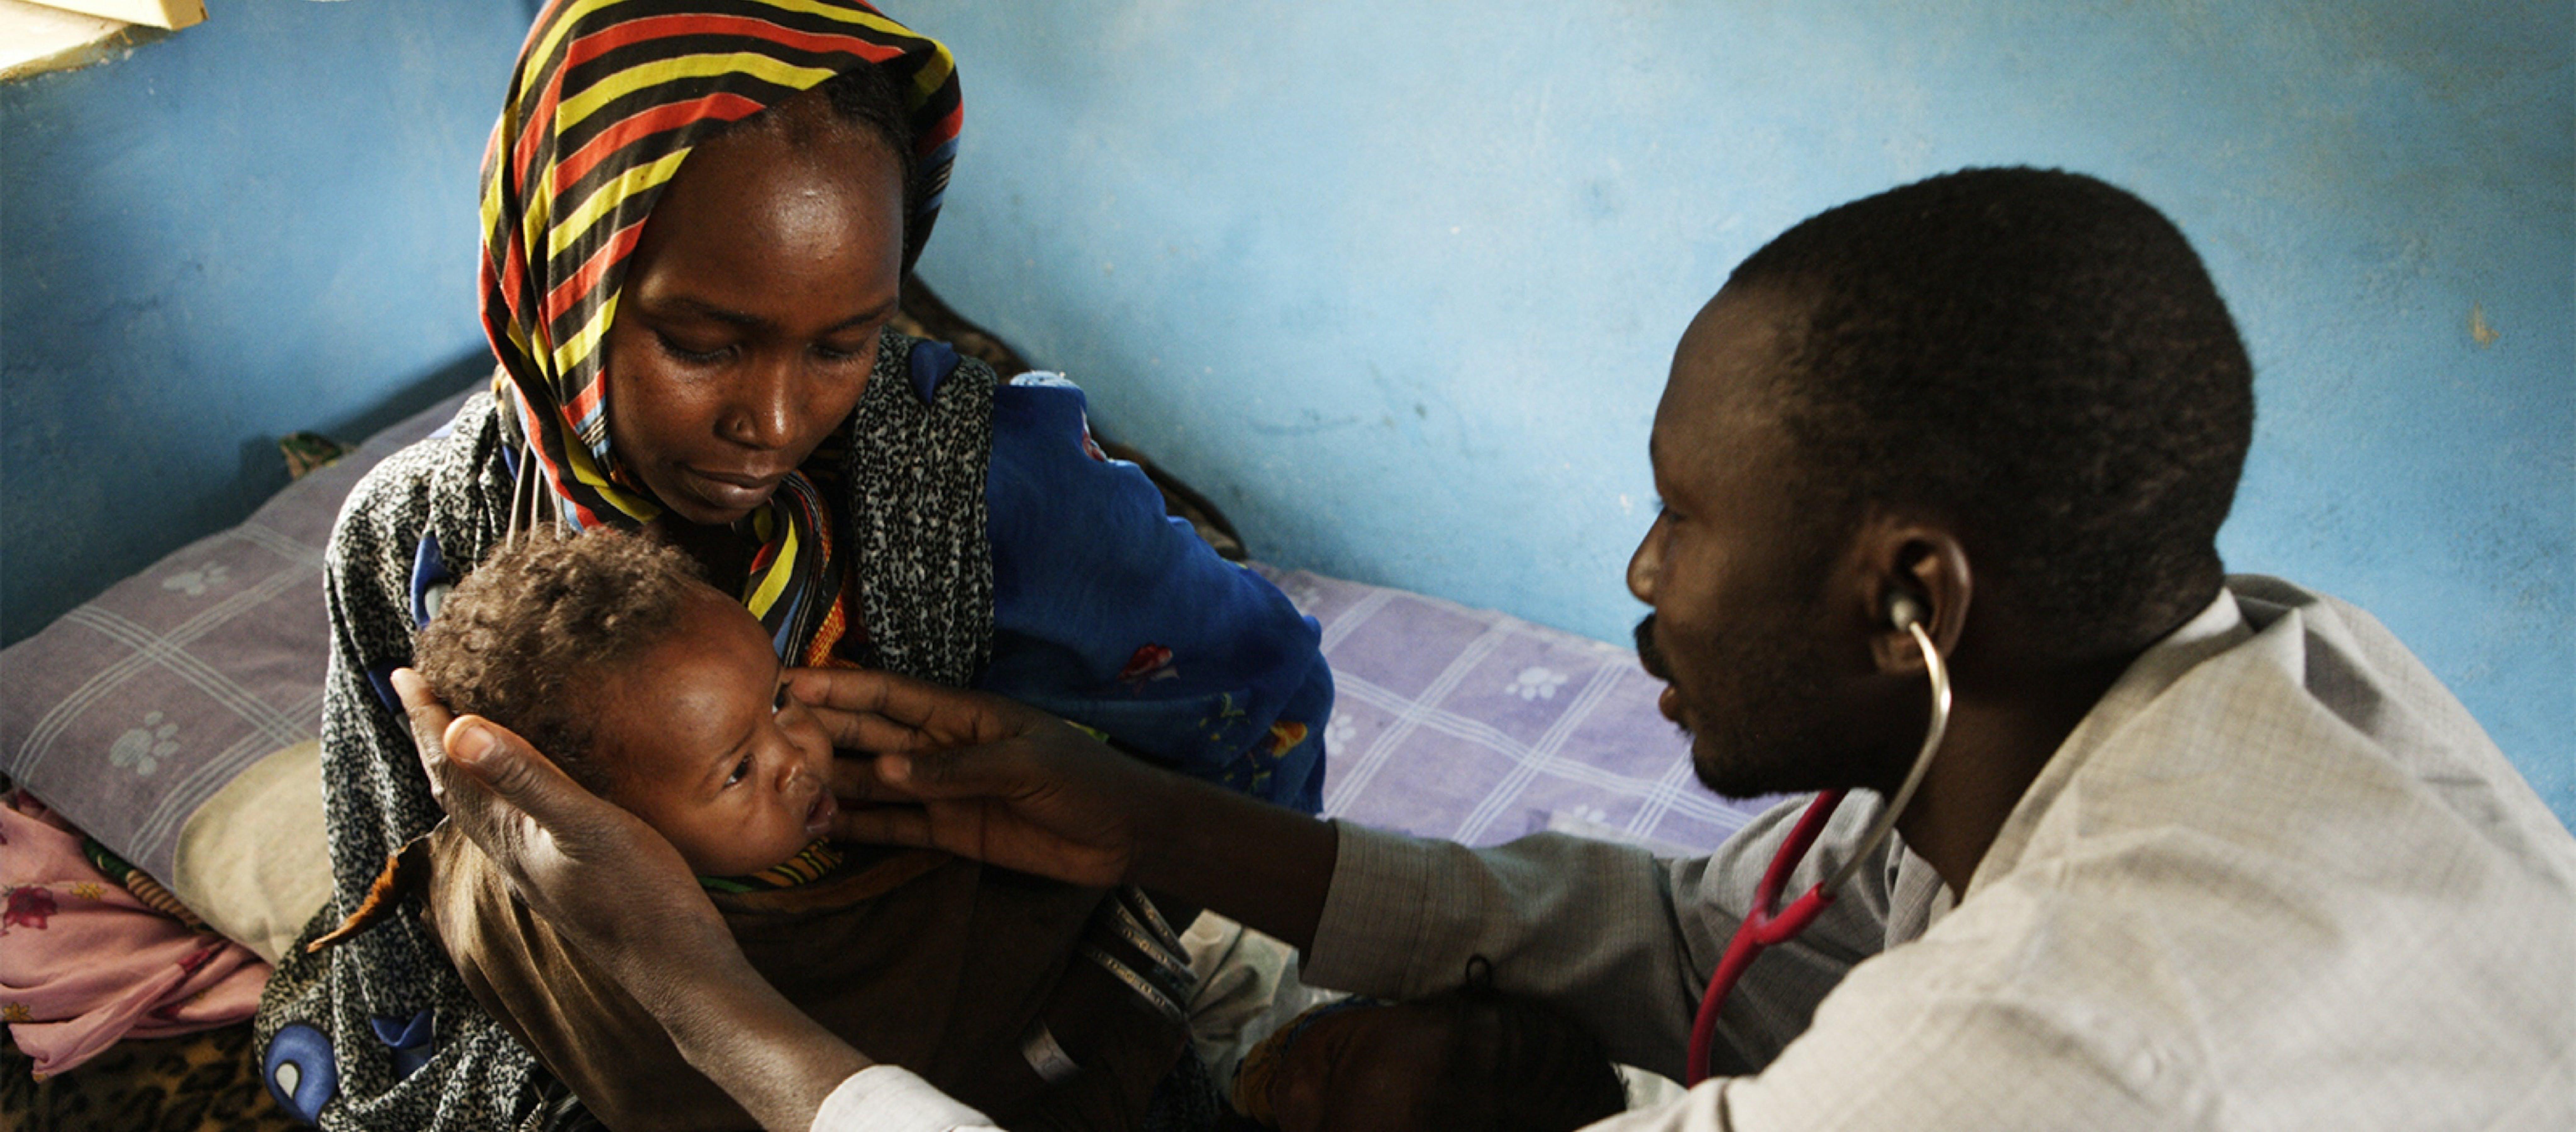 Visita medica in un ospedale del Ciad